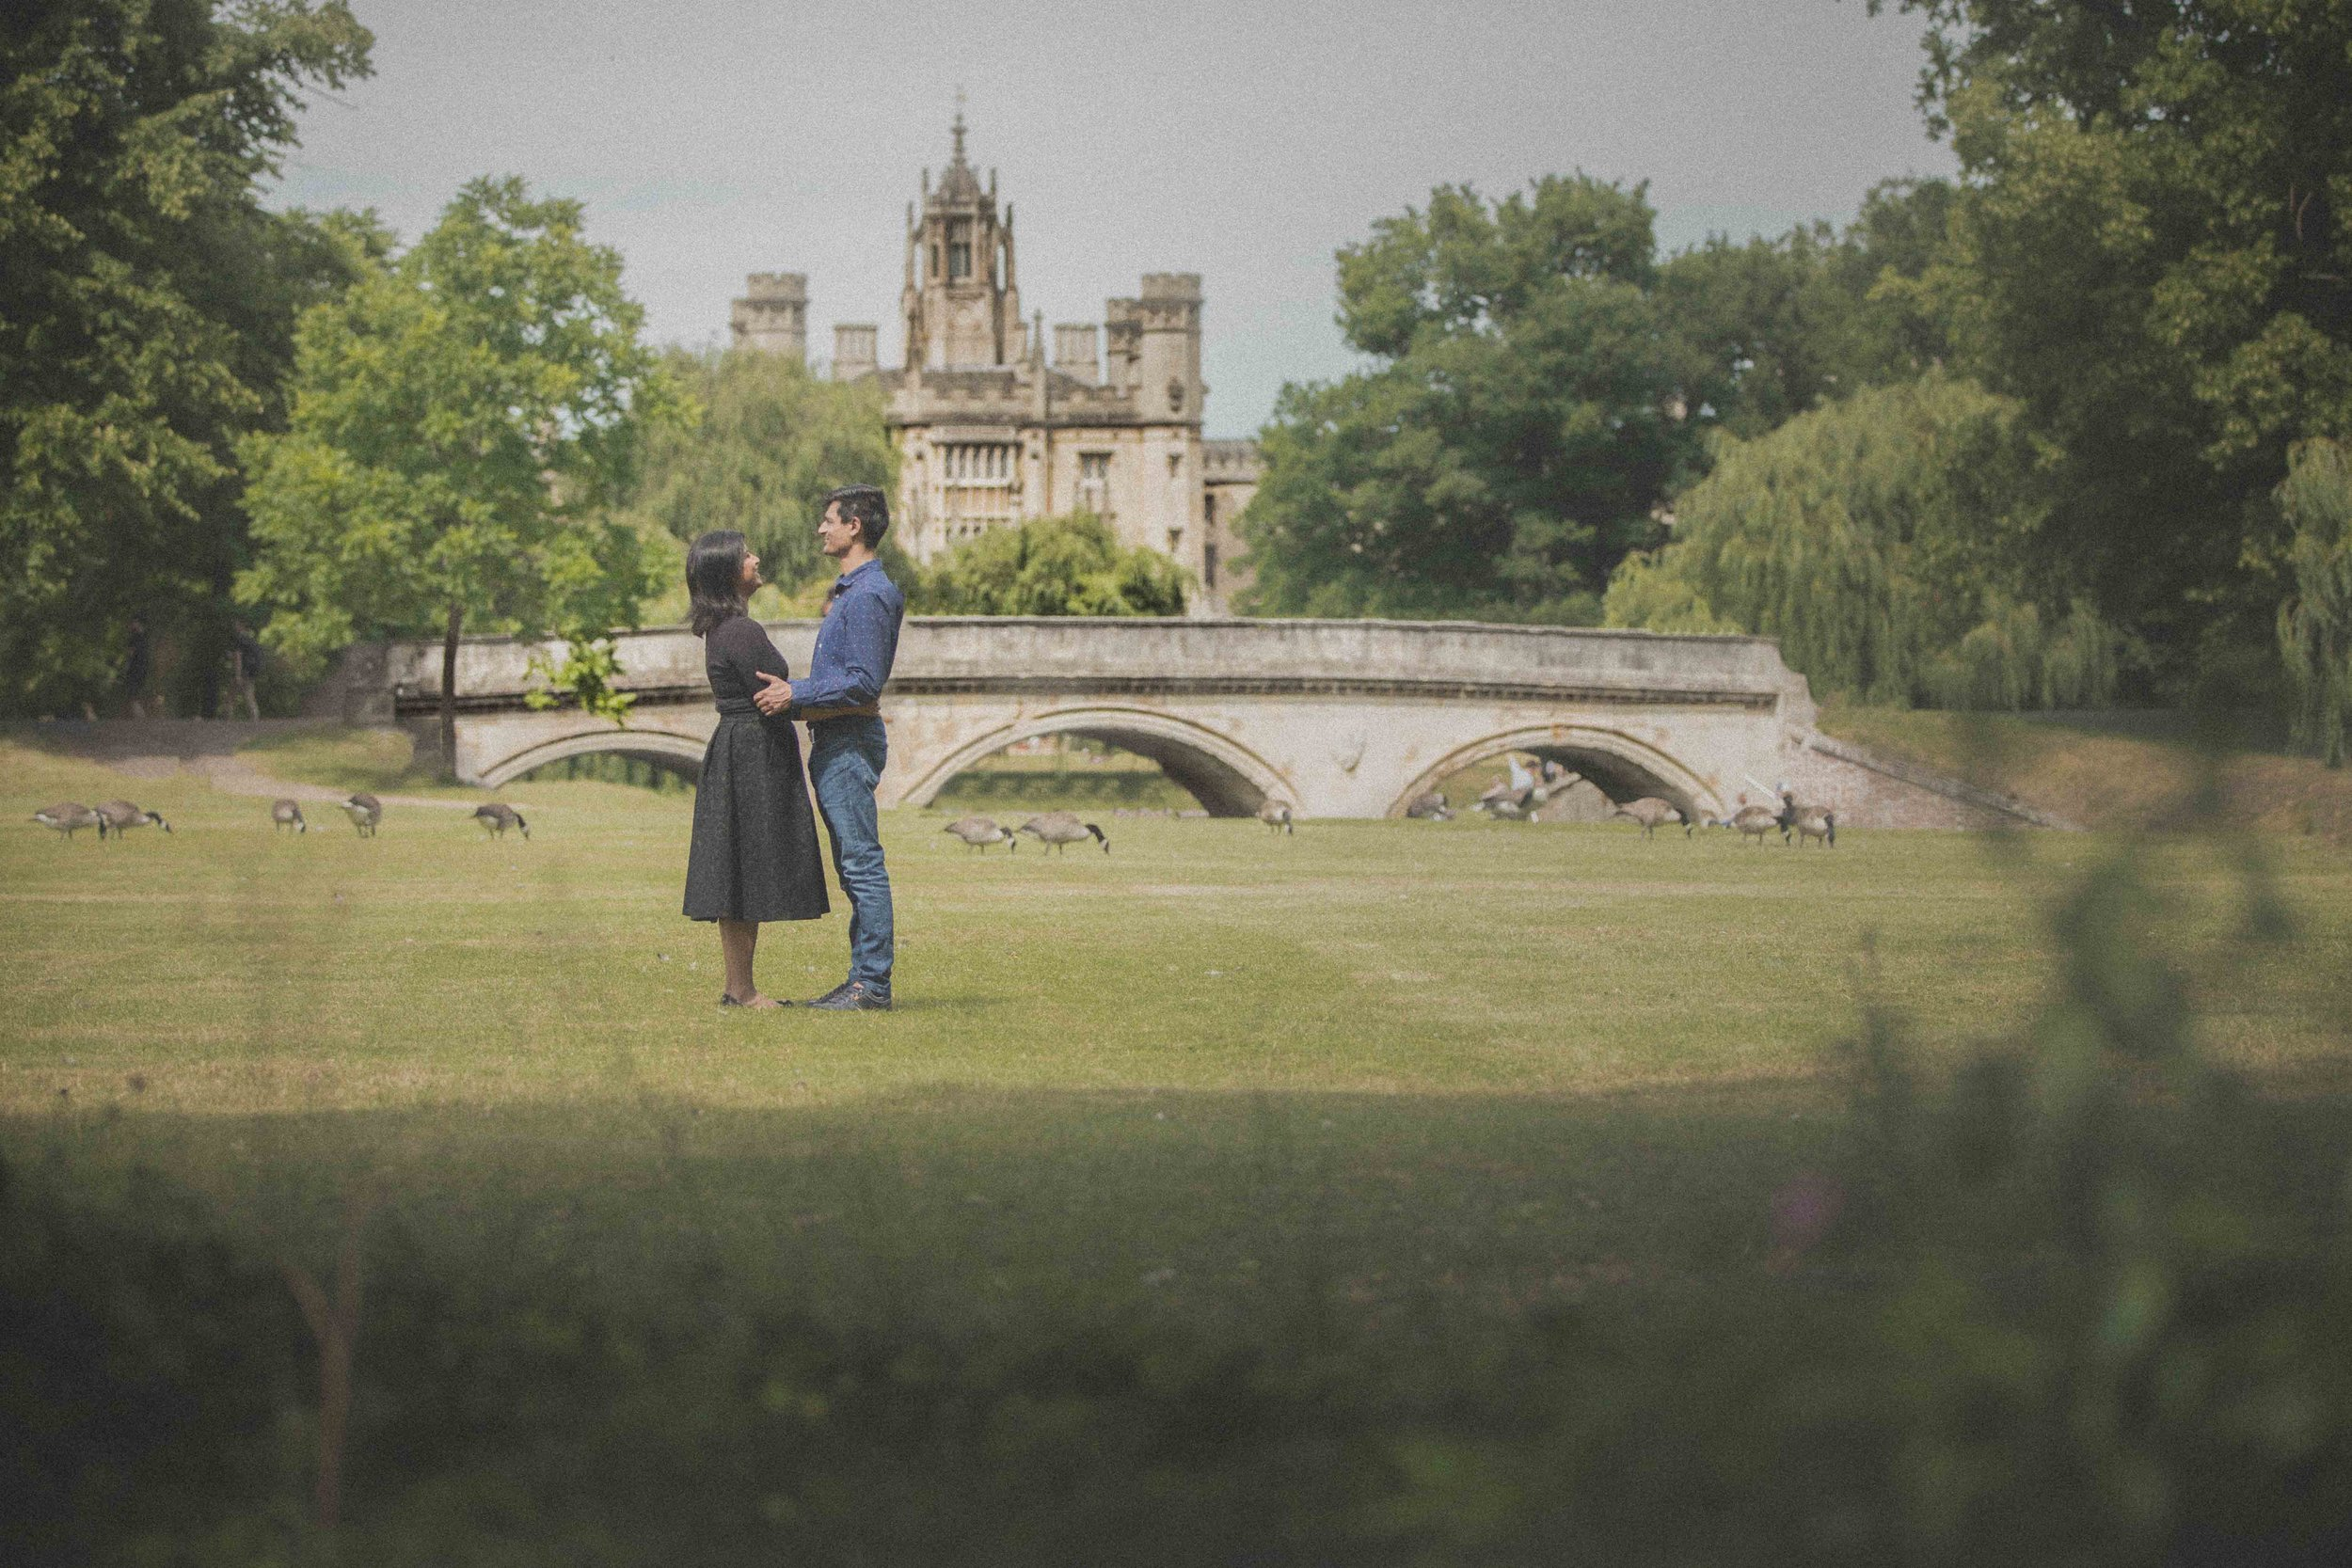 cambridge-pre-wedding-prewedding-engagement-photoshoot-shoot-photographer-asian-wedding-natalia-smith-photography-9.jpg